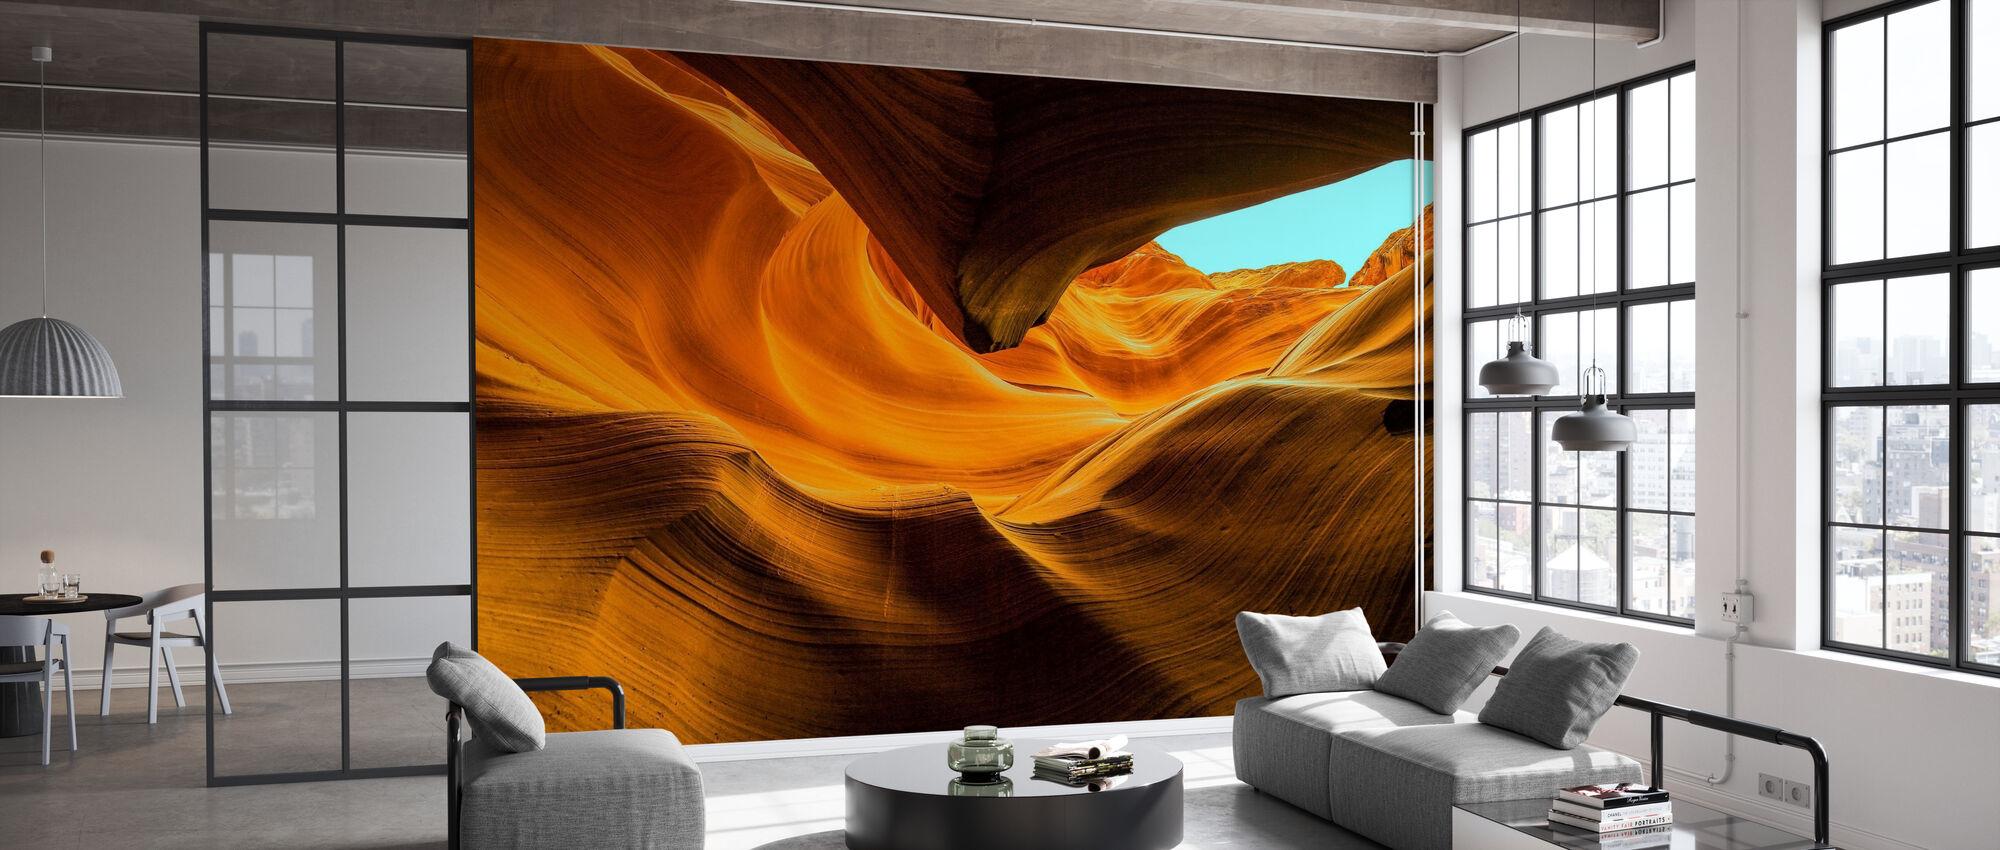 Arizona Canyon - Wallpaper - Office